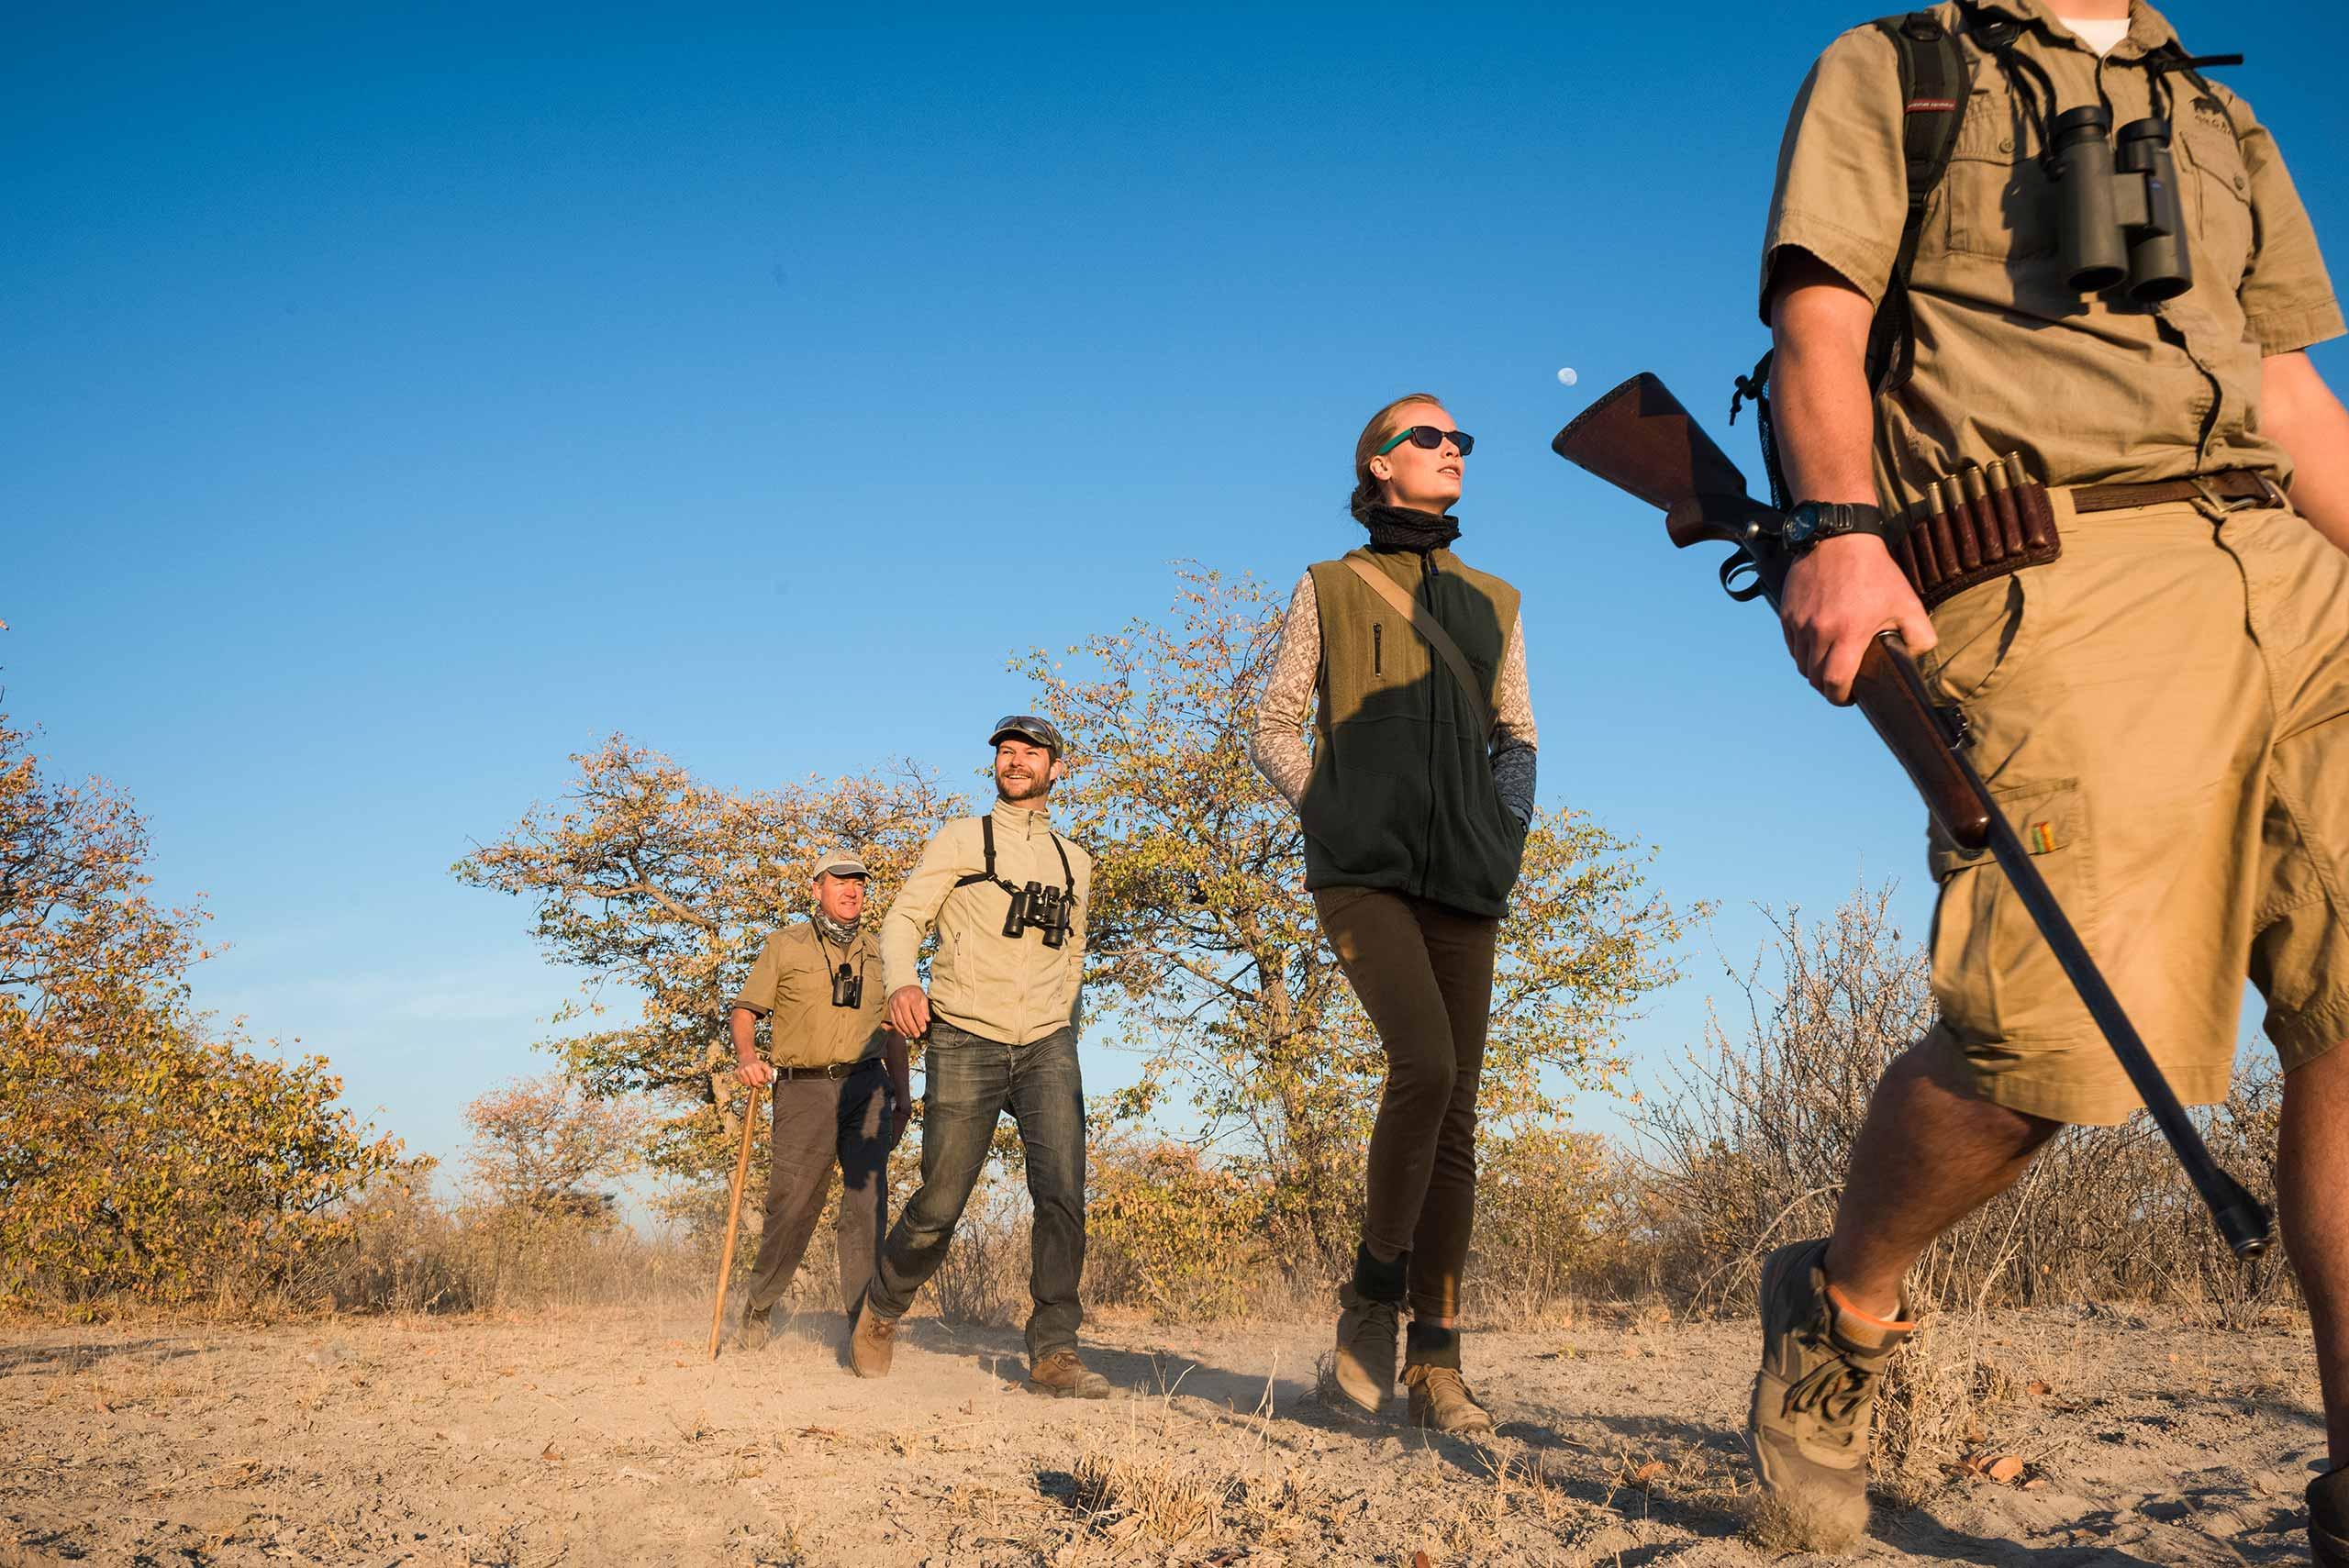 enkosi-africa-safari-namibia-etosha-little-ongava-walking-safari